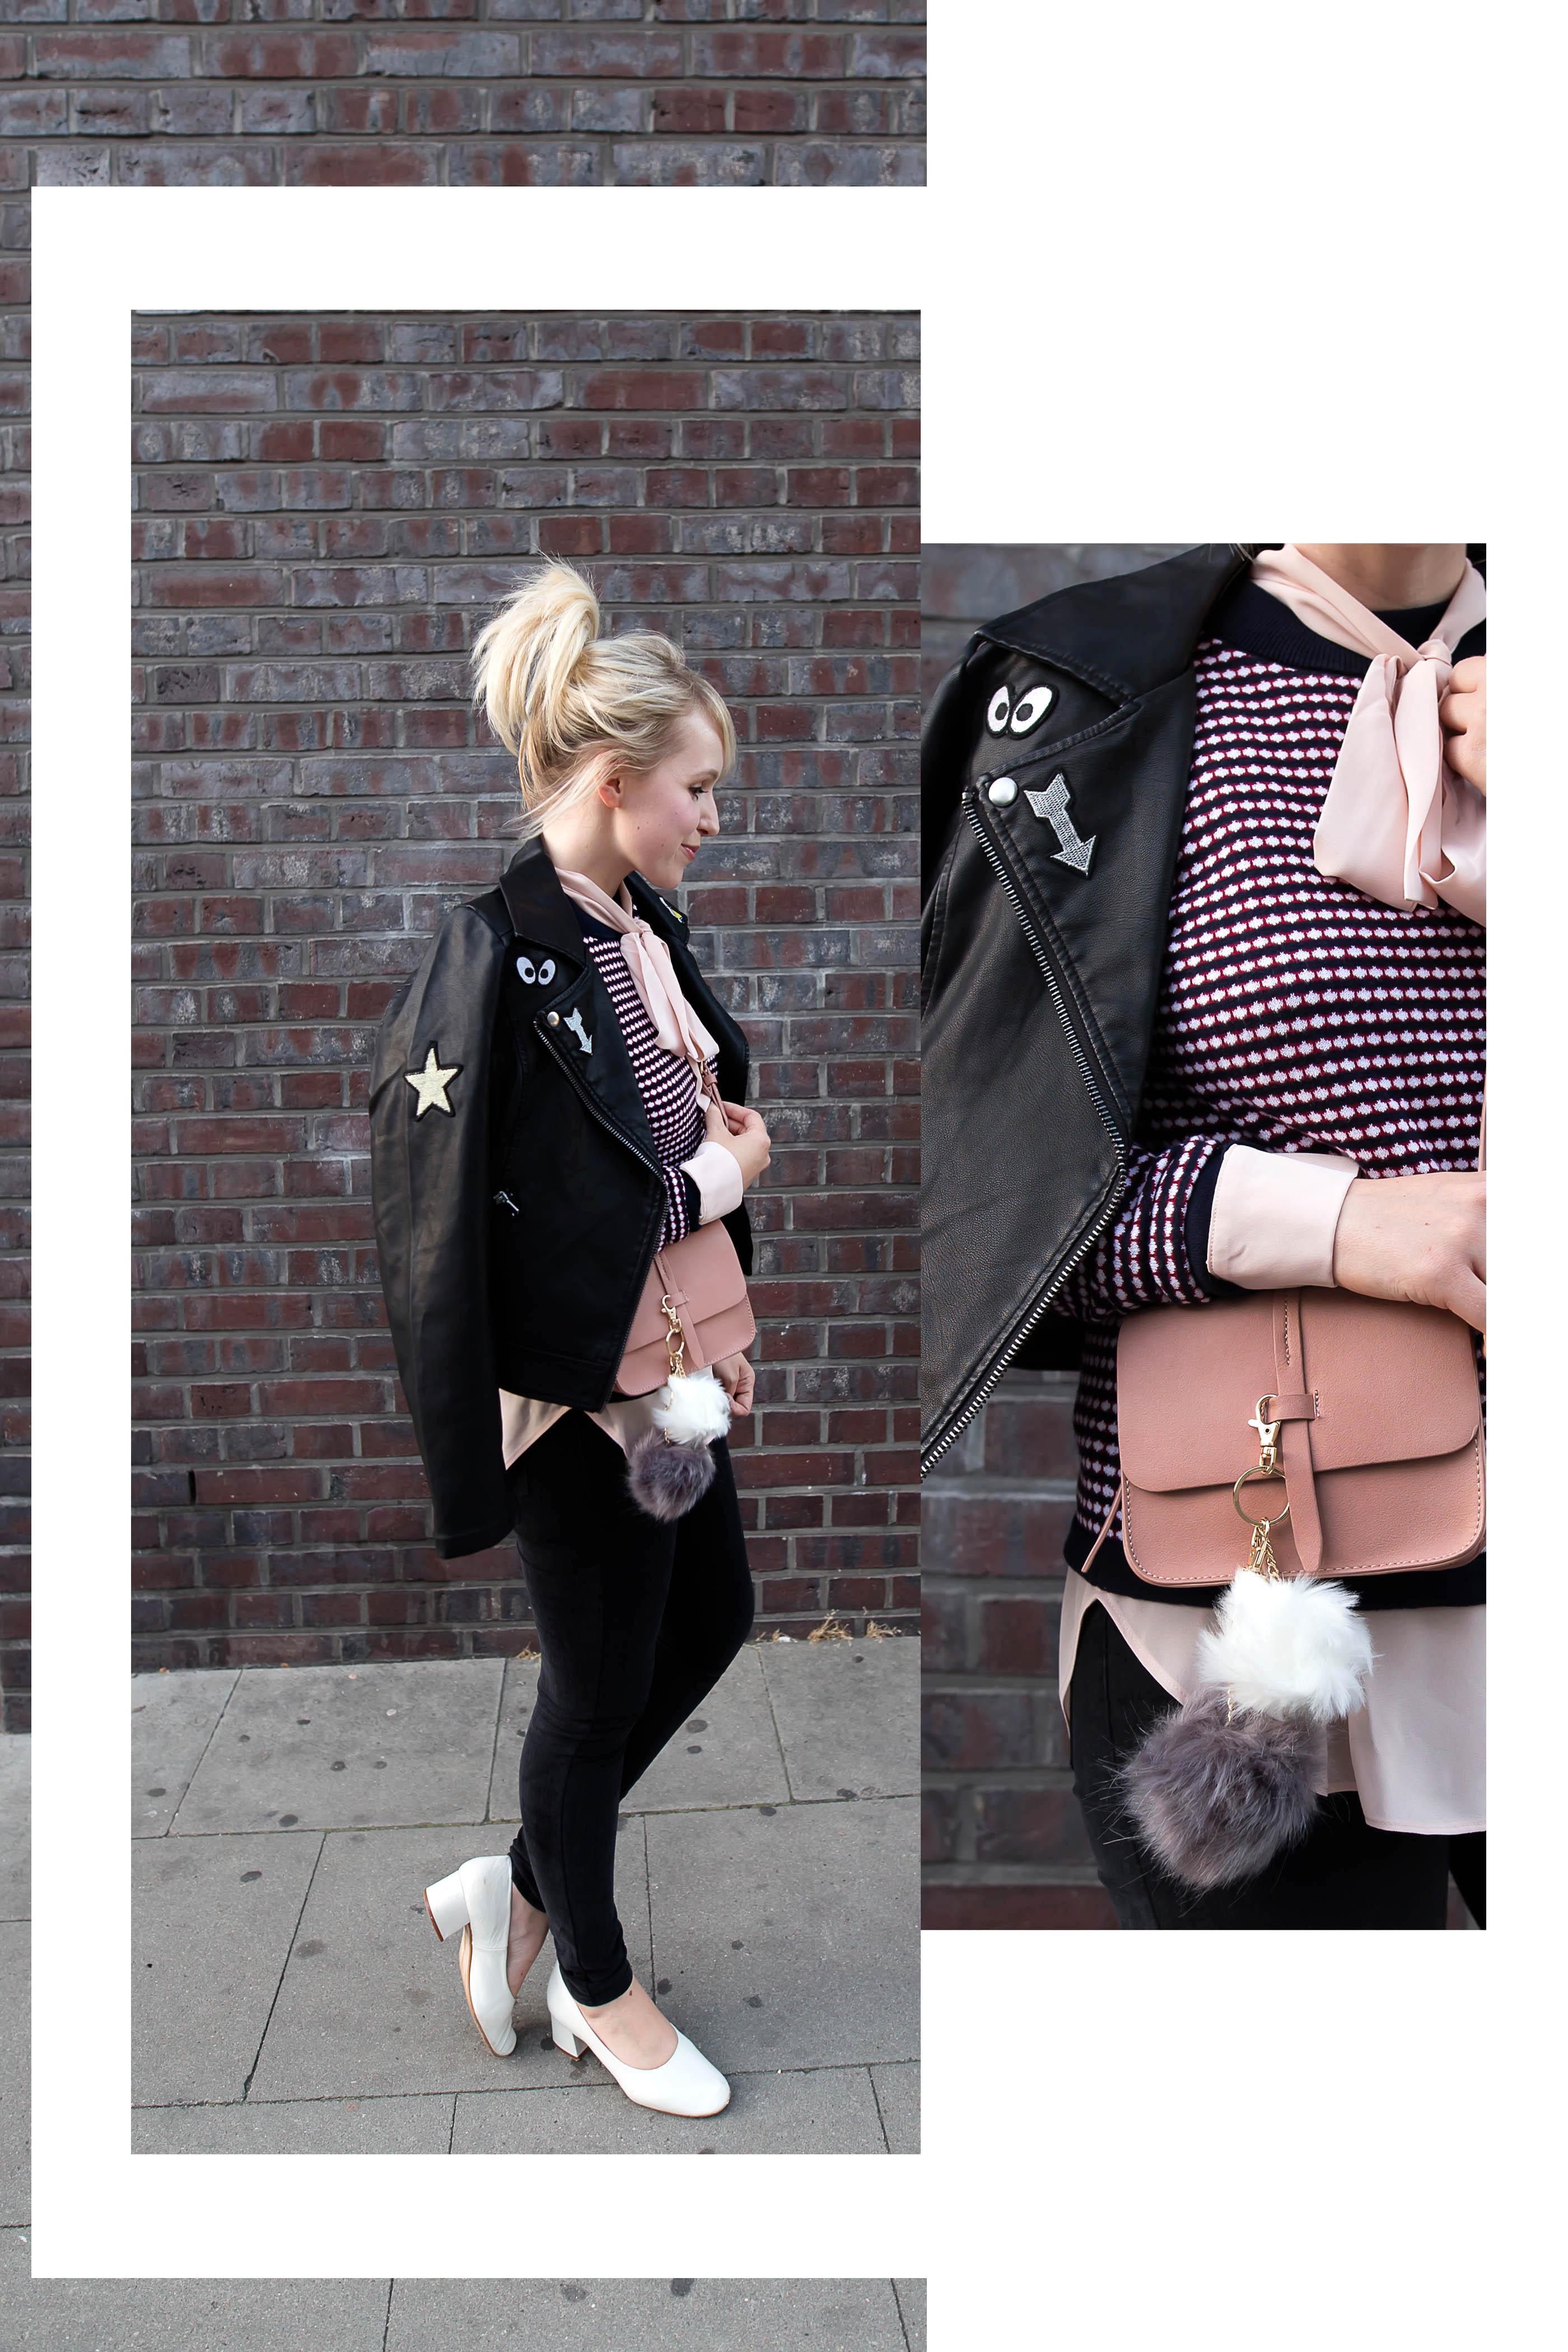 fashion_event_cunda_zara_hundm_shoppen_inspiration_hamburg_2